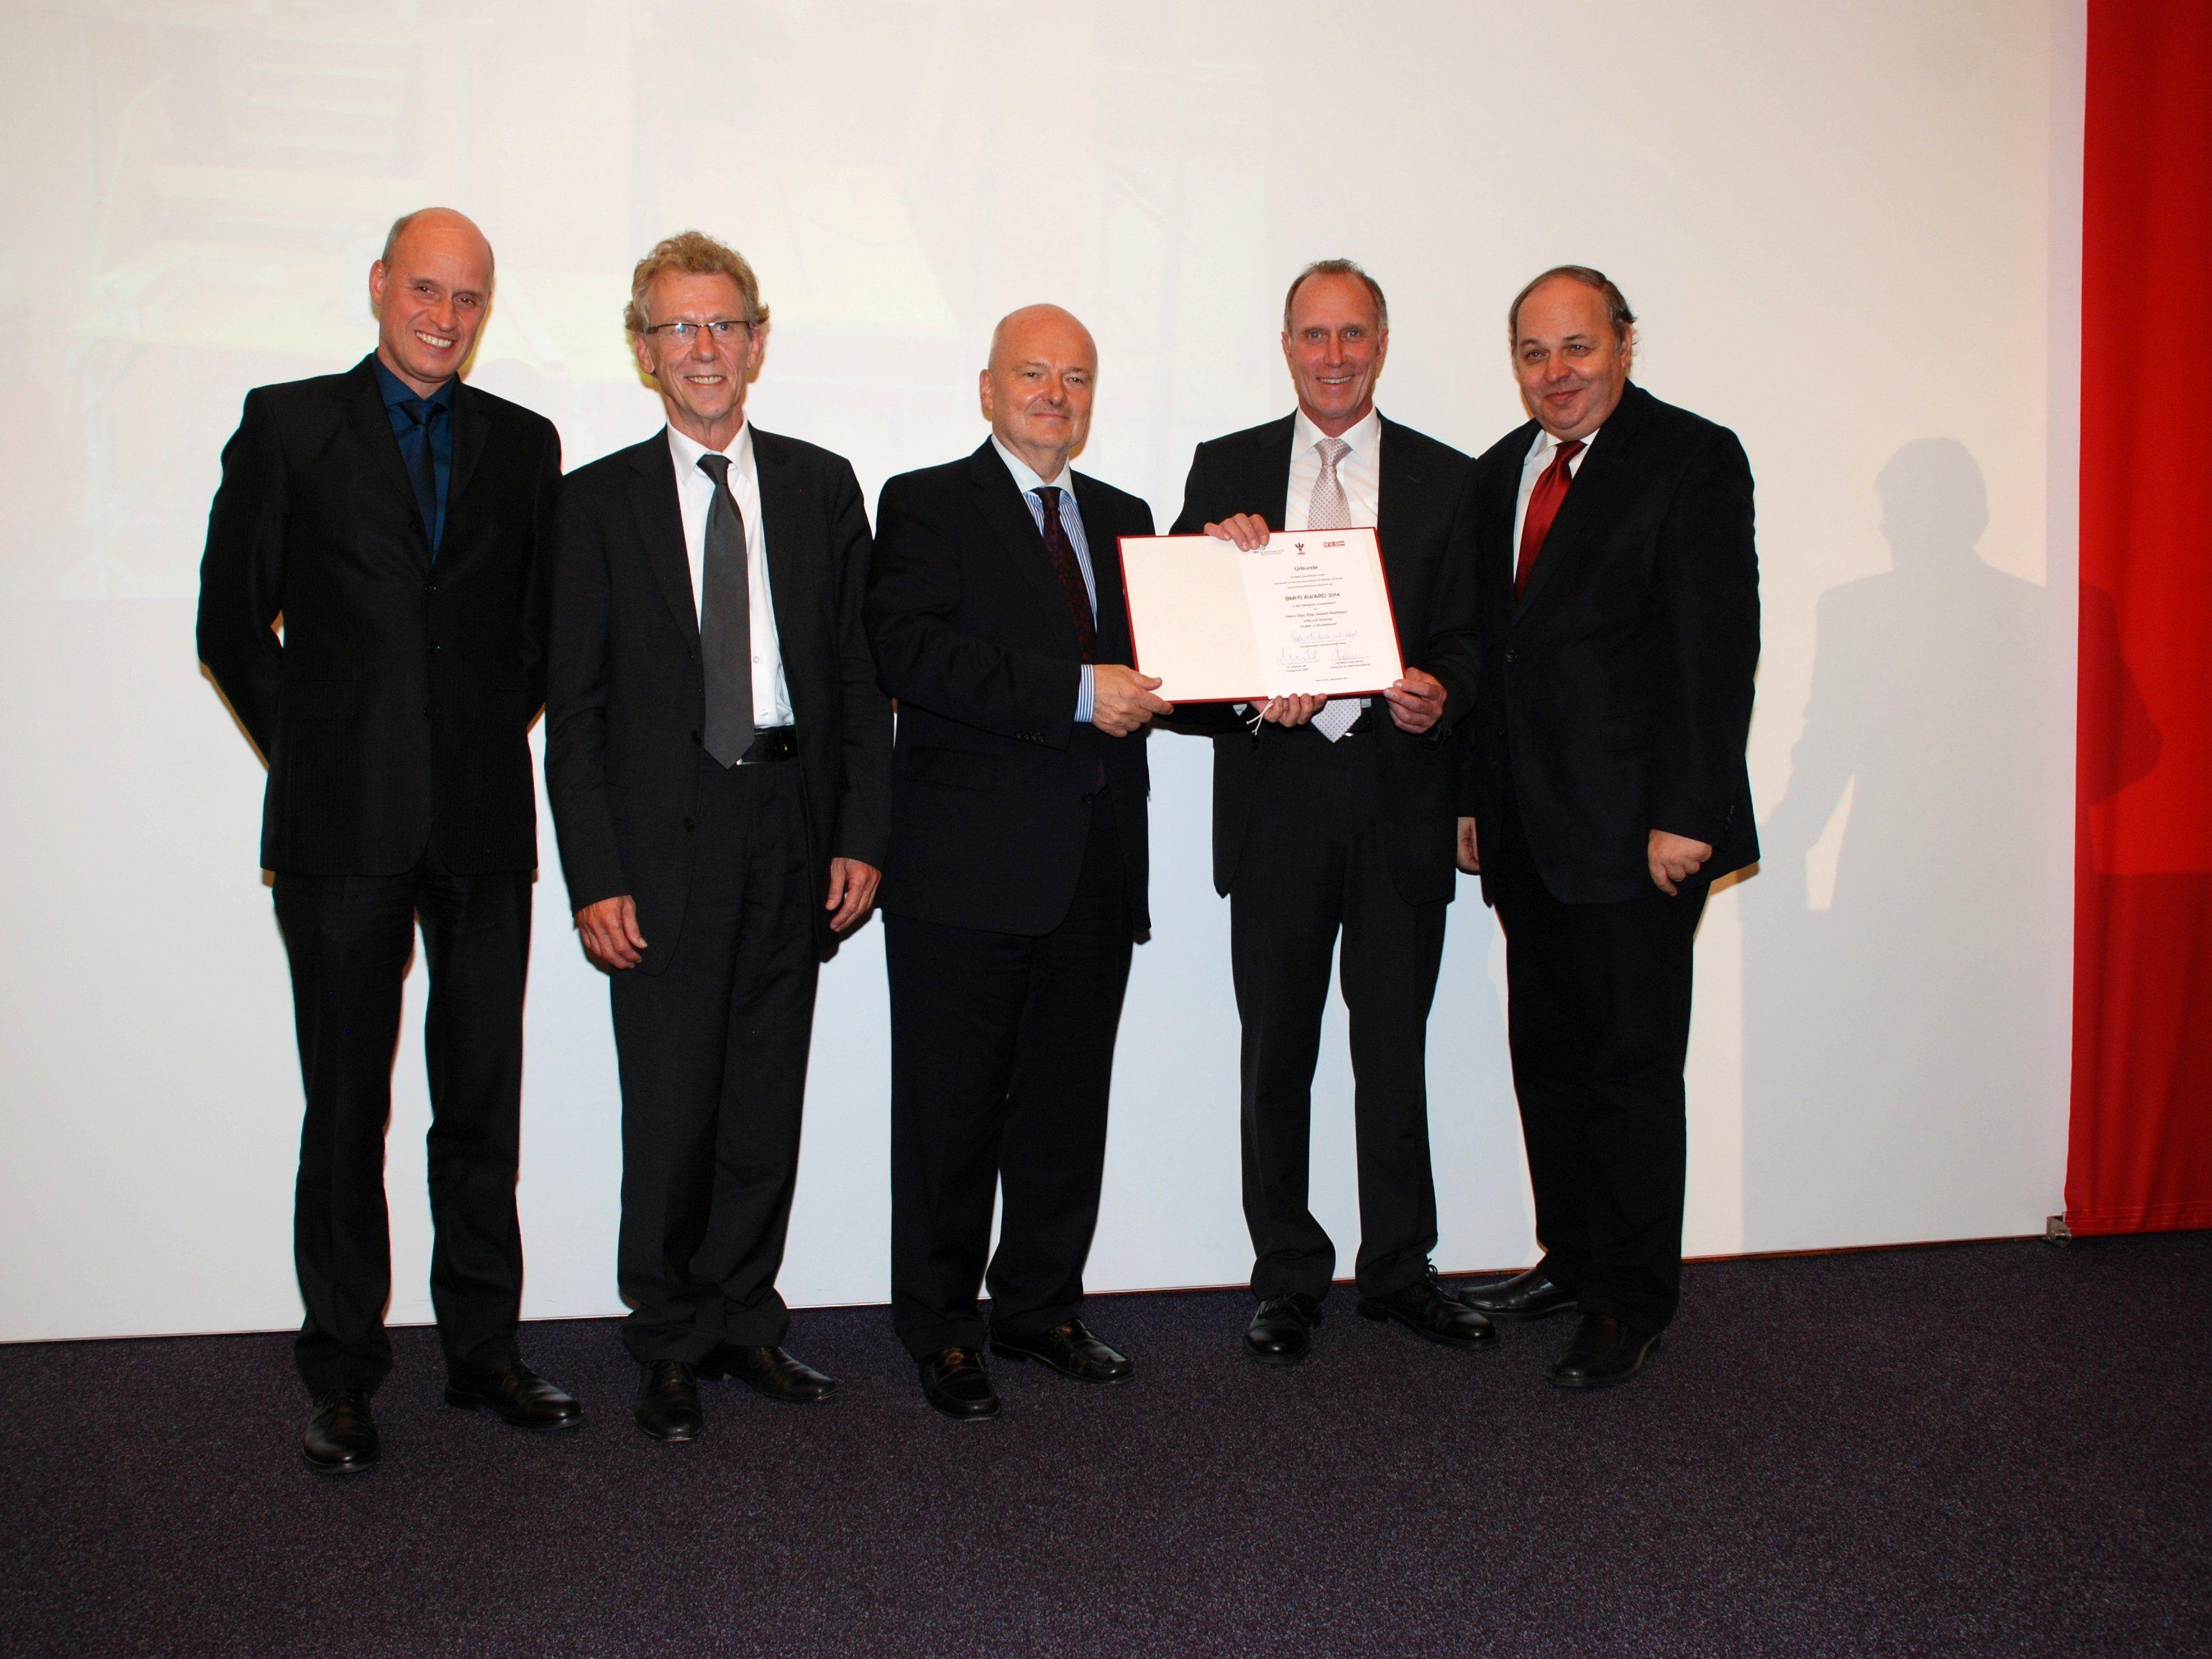 BMHS-Award 2014 an Robert Nachbaur. v.li.: DI Johannes Schwärzler (LSR f. Vorarlberg), DI Gerhard Wimmer (Direktor HTL Rankweil), Dr. Michael Landertshammer (WKÖ), Preisträger Dipl.-Päd. Robert Nachbaur, DI Dr. Christian Dorninger (BMBF).